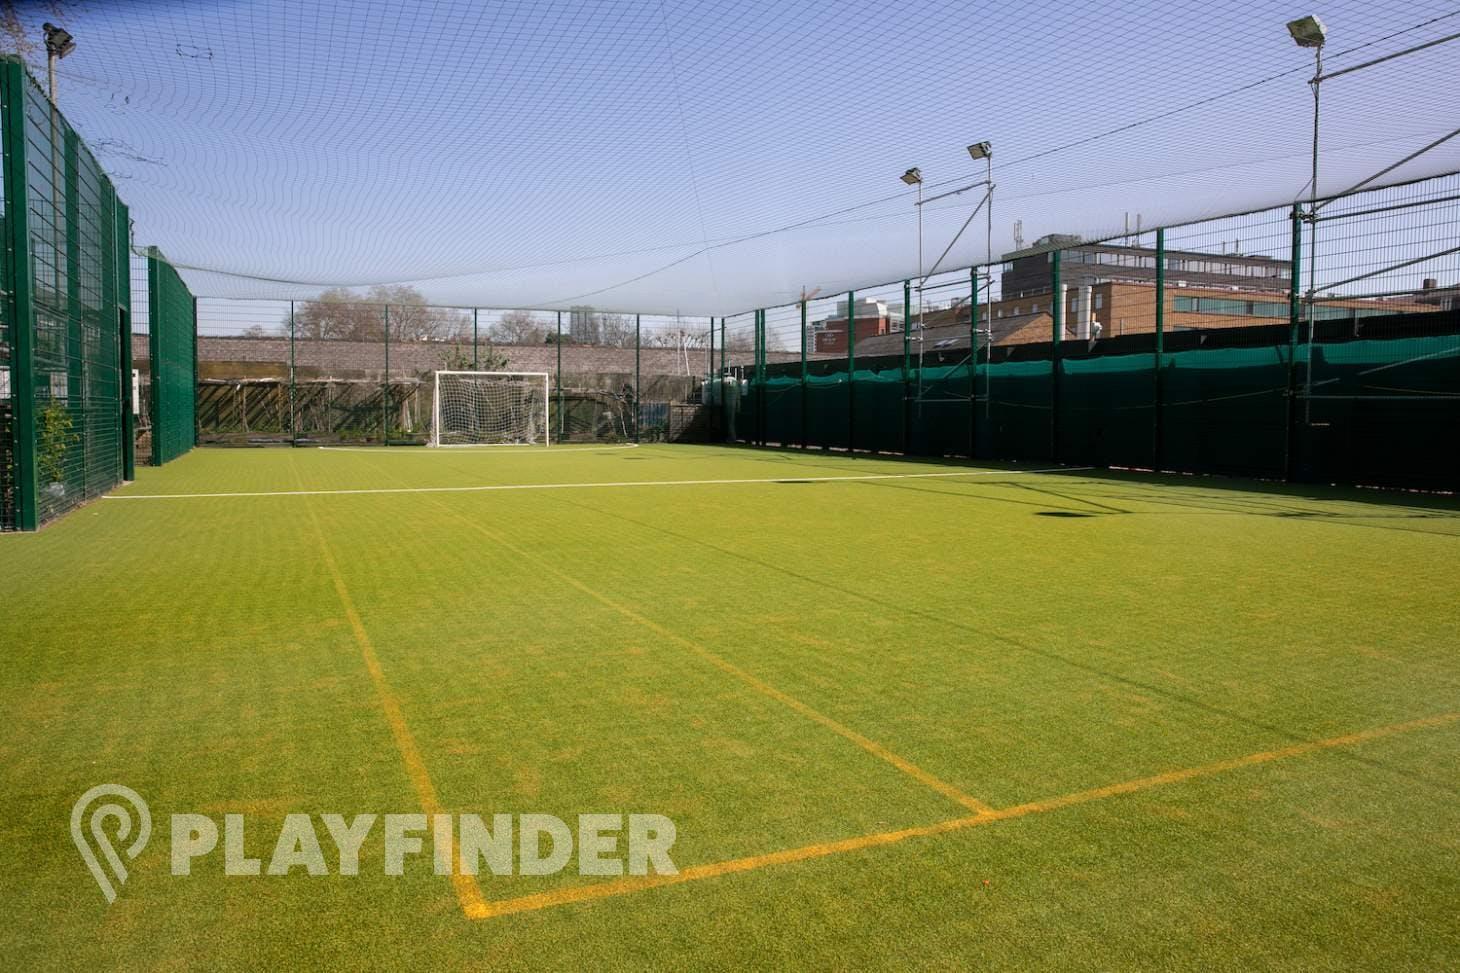 Calthorpe Community Garden - 5ASIDE FC 5 a side | 3G Astroturf football pitch